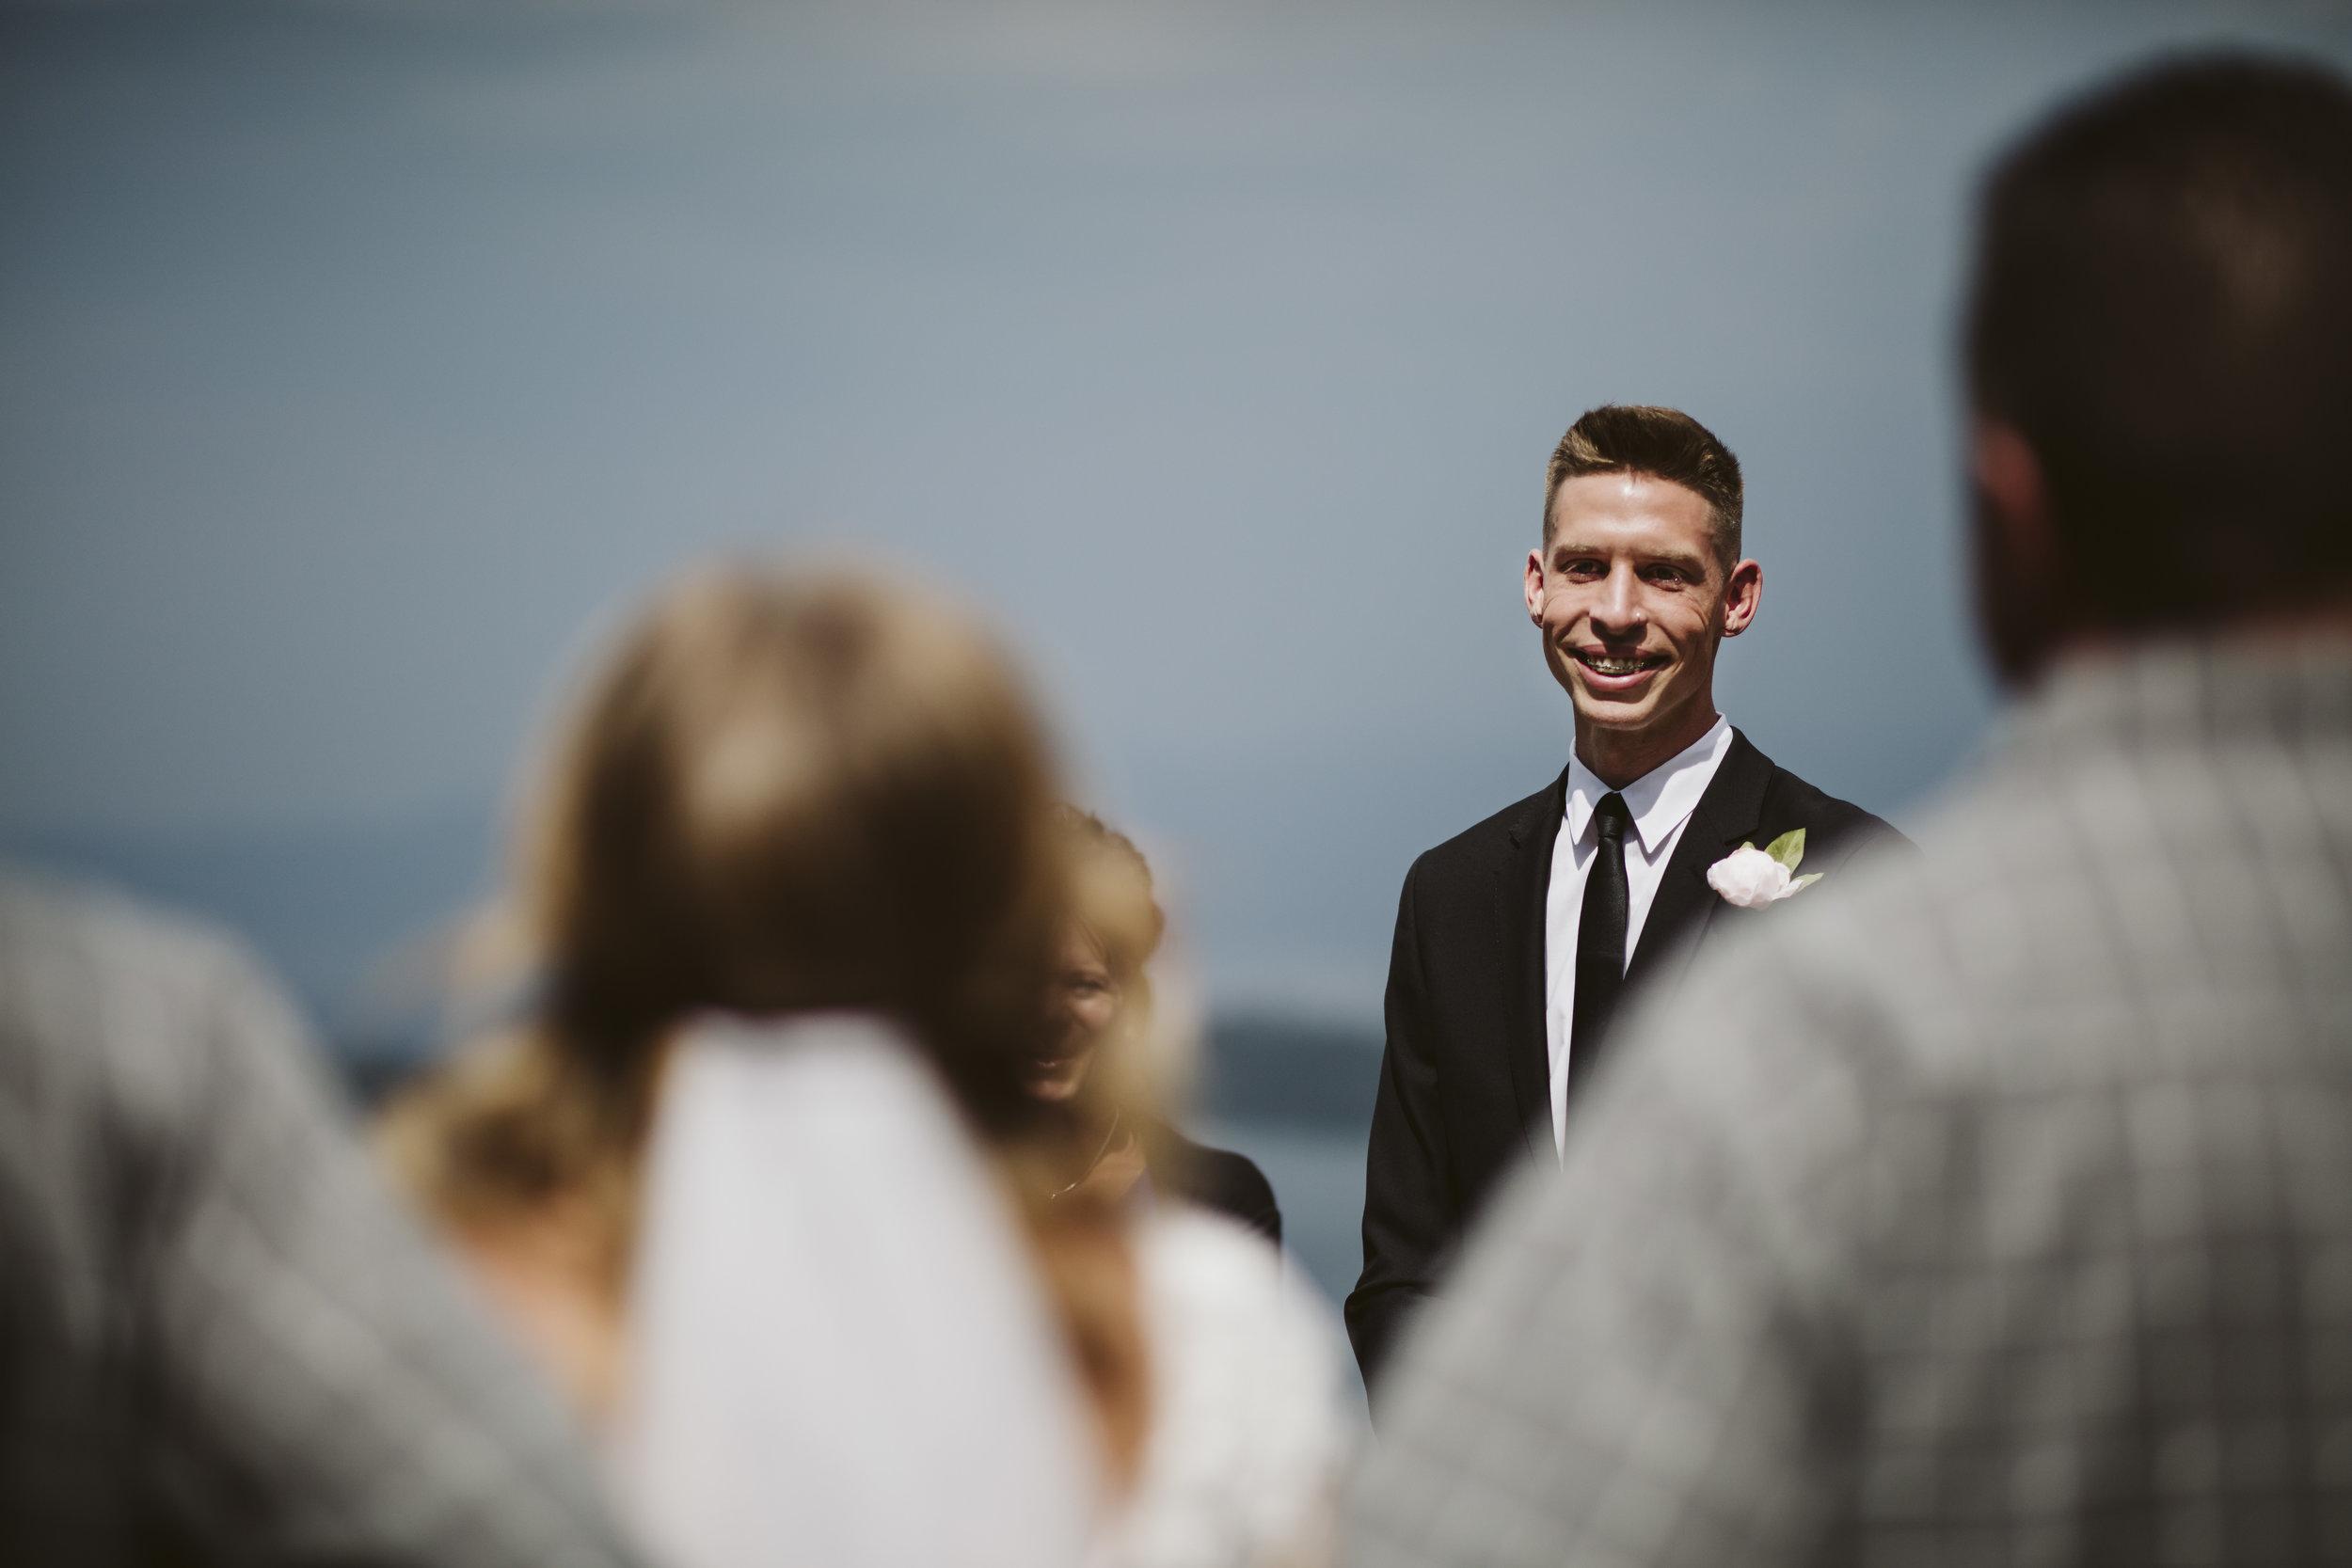 _P8A0213vildphotography-adventurewedding-adventurouswedding-tahoewedding-laketahoewedding-adventureelopement-laketahoeweddingphotographer-wedding-photographer-weddingphotographer-Chase-Sam.jpg